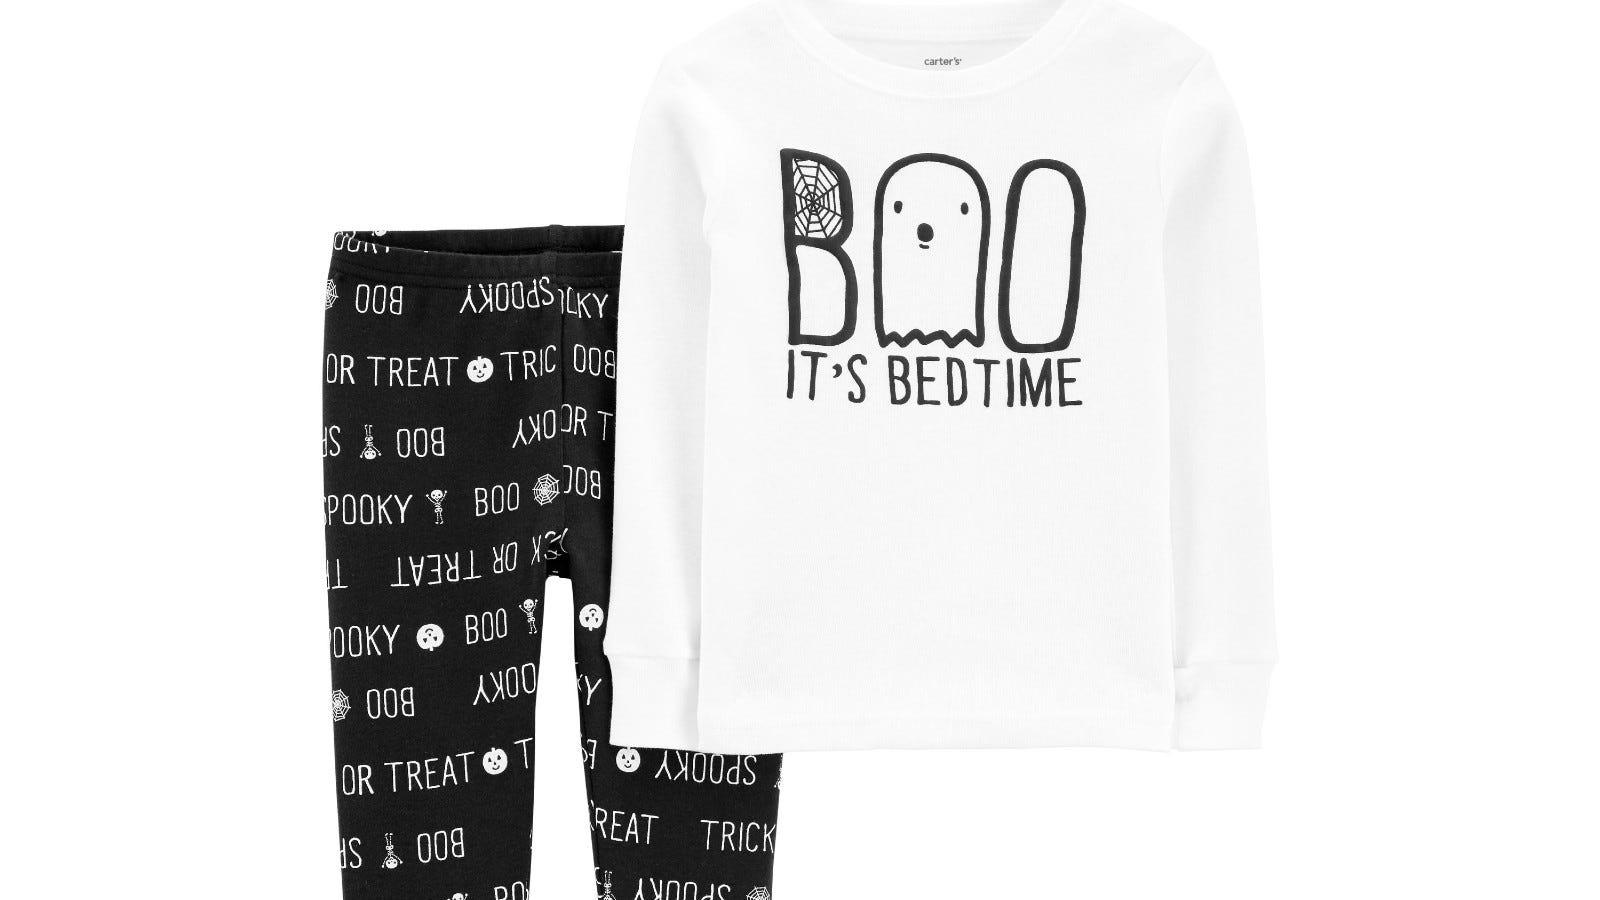 Carter's Two-Piece Boo Halloween Snug Fit PJ's.